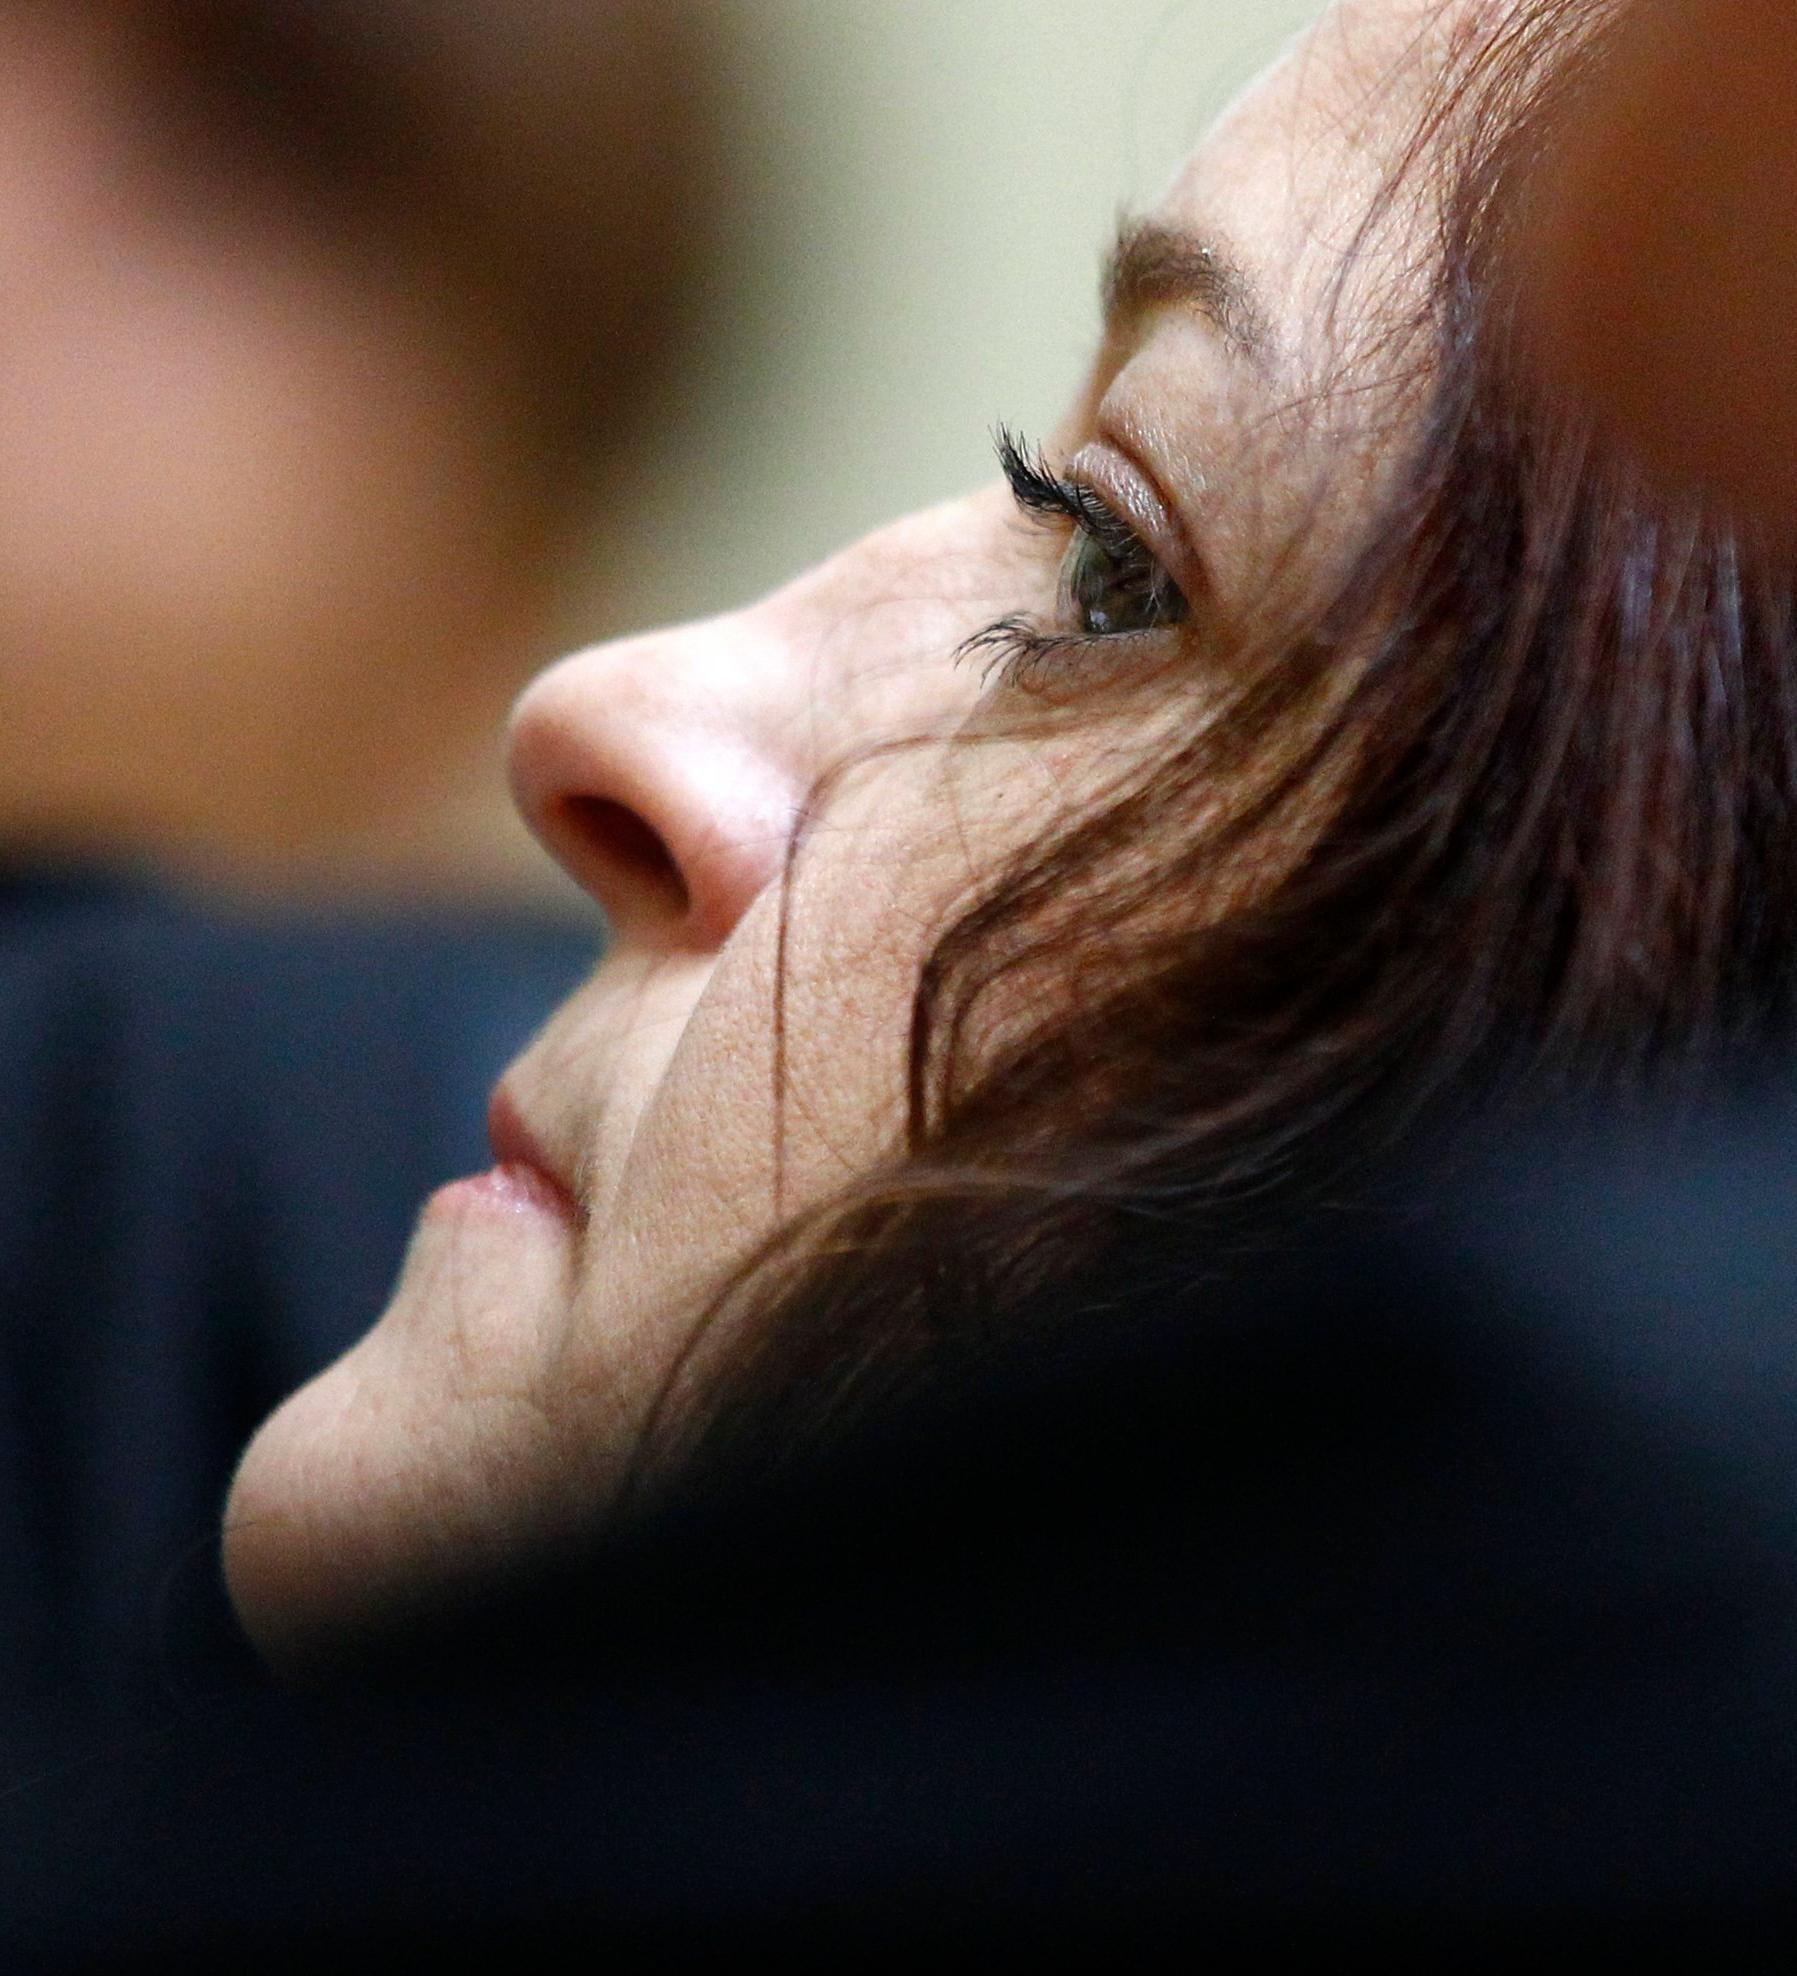 The neo-Nazi murder trial revealing Germany's darkest secrets